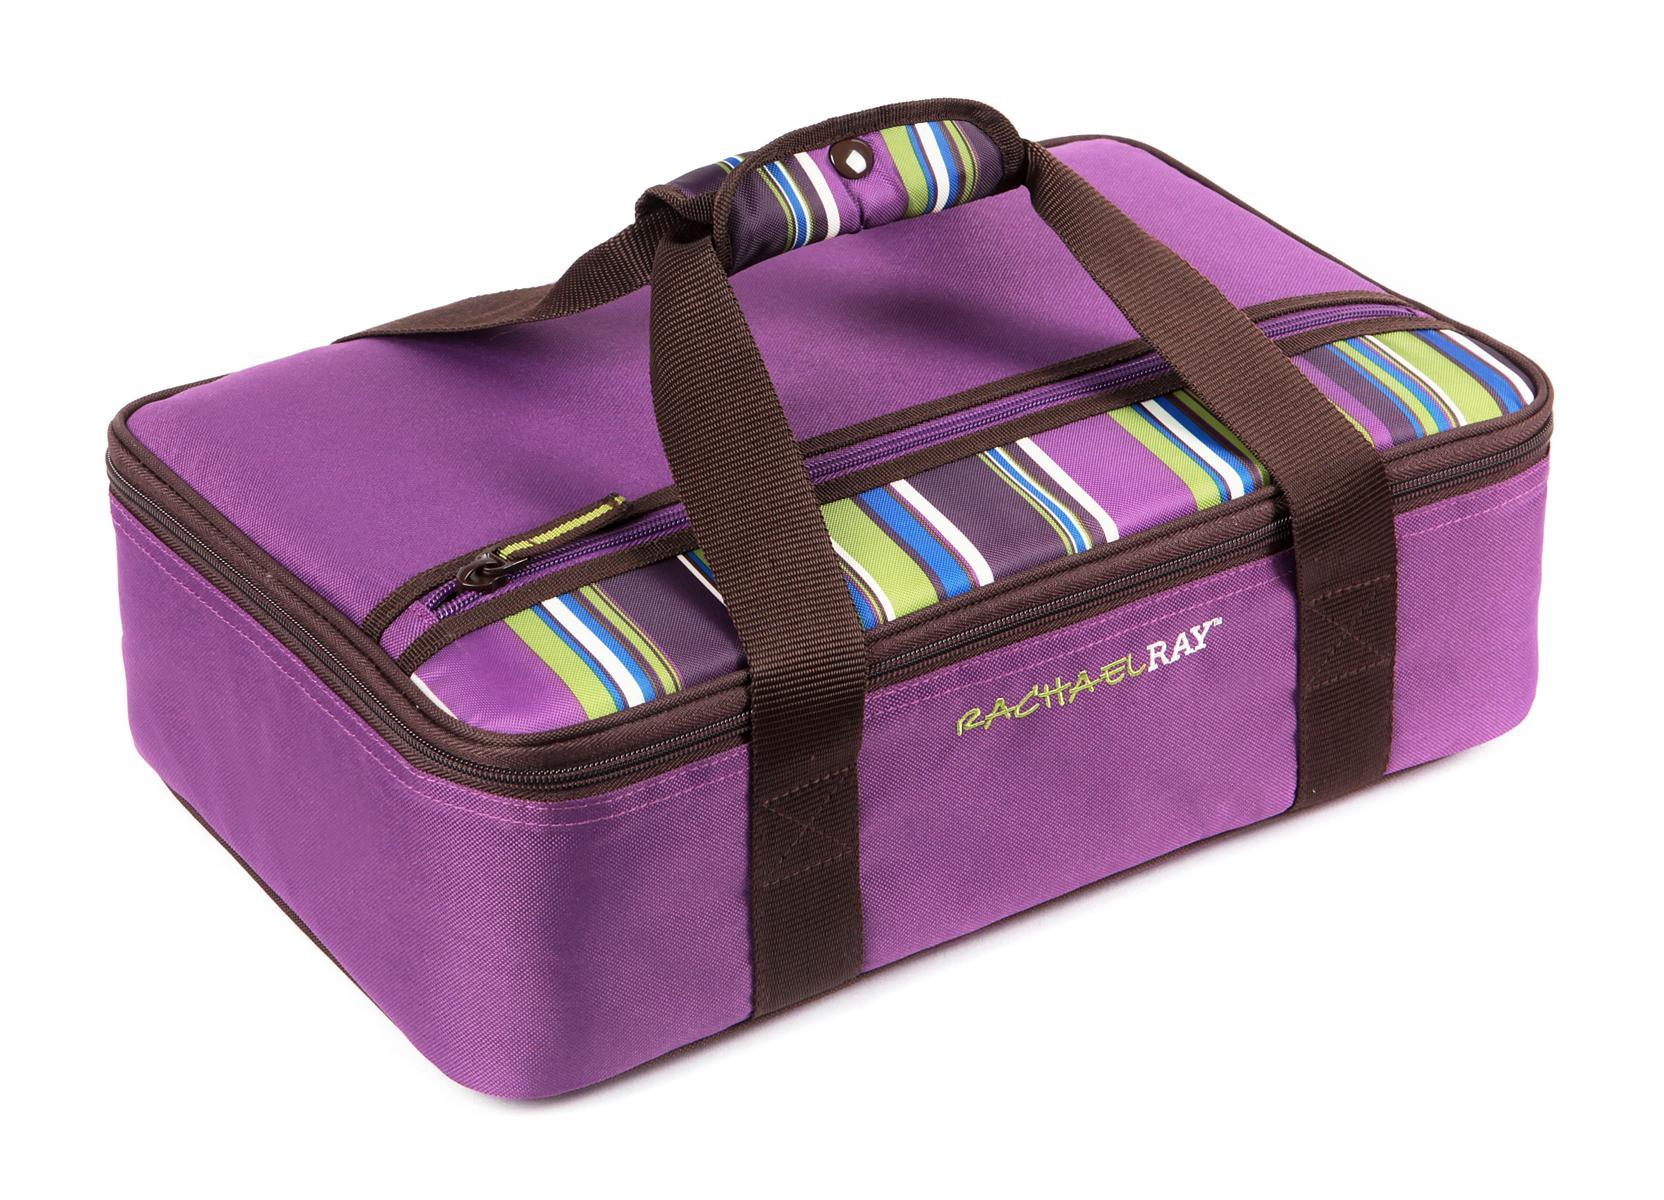 Amazon.com: Rachael Ray Lasagna Lugger, Purple: Rachael Ray ...